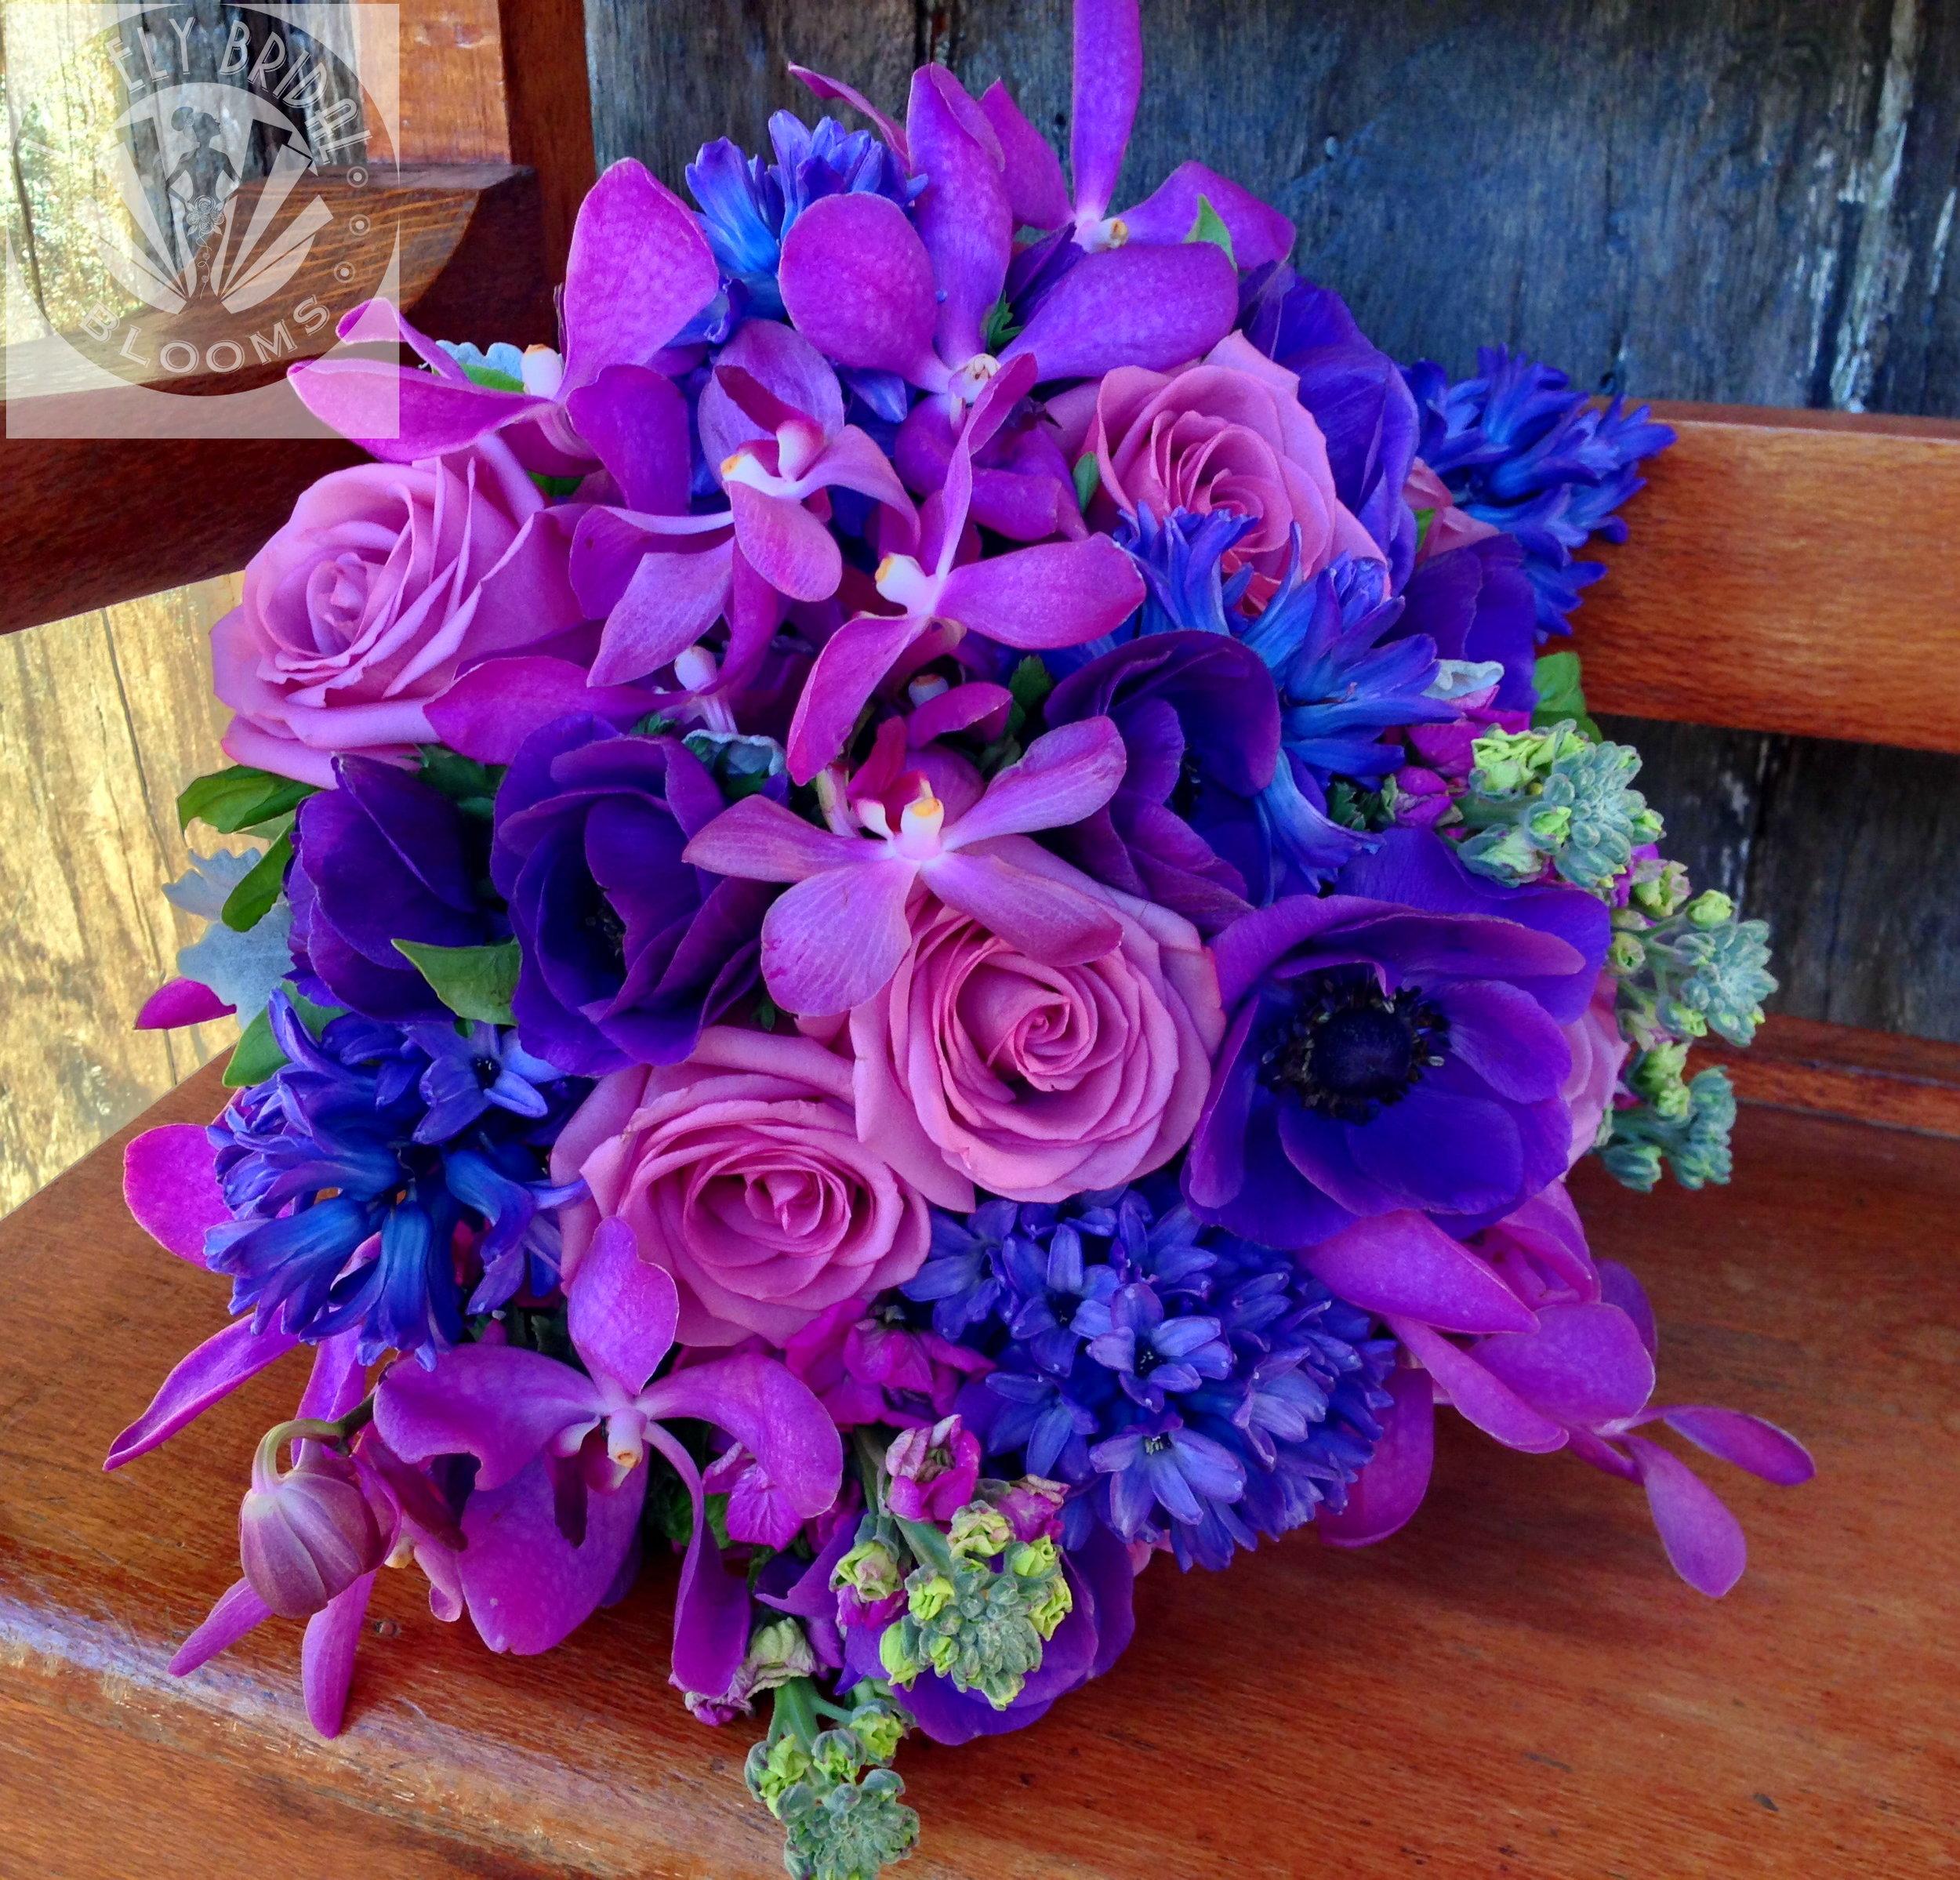 anemones hyacinth stock orchids roses bride Jade.jpg